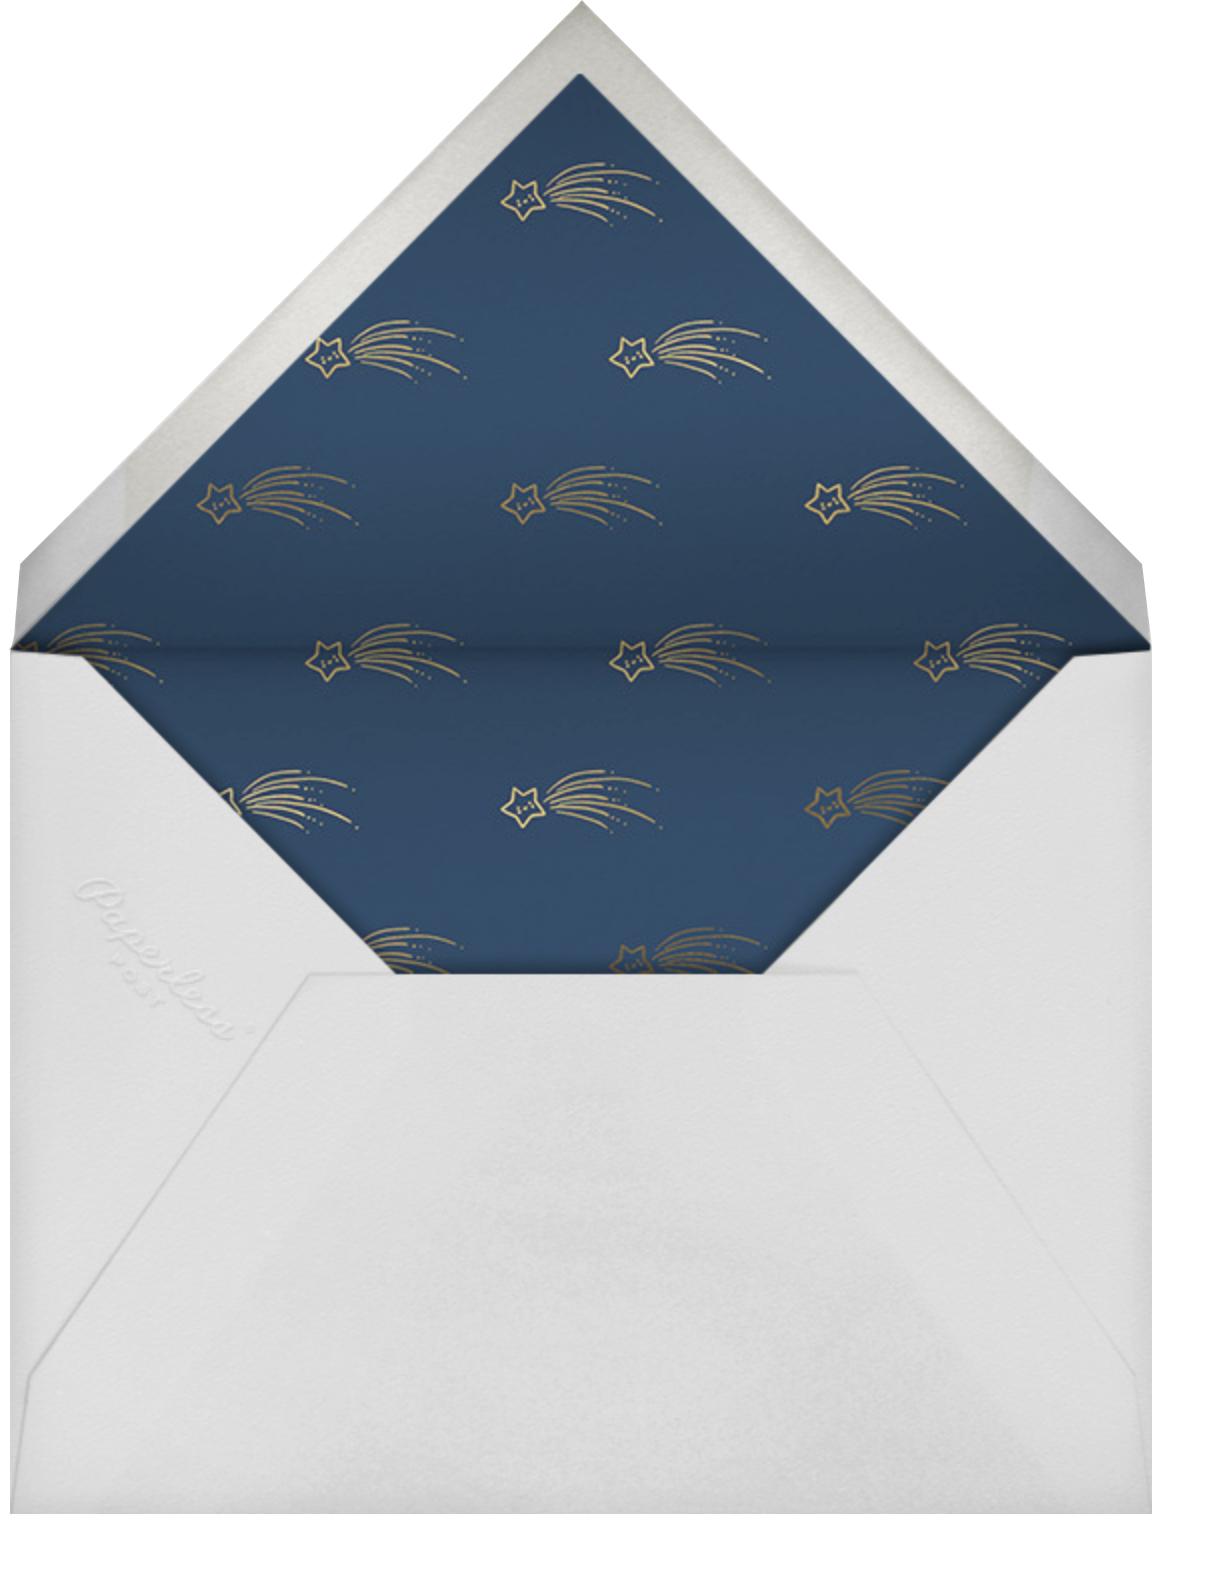 Star Treatment Photo - Little Cube - Envelope